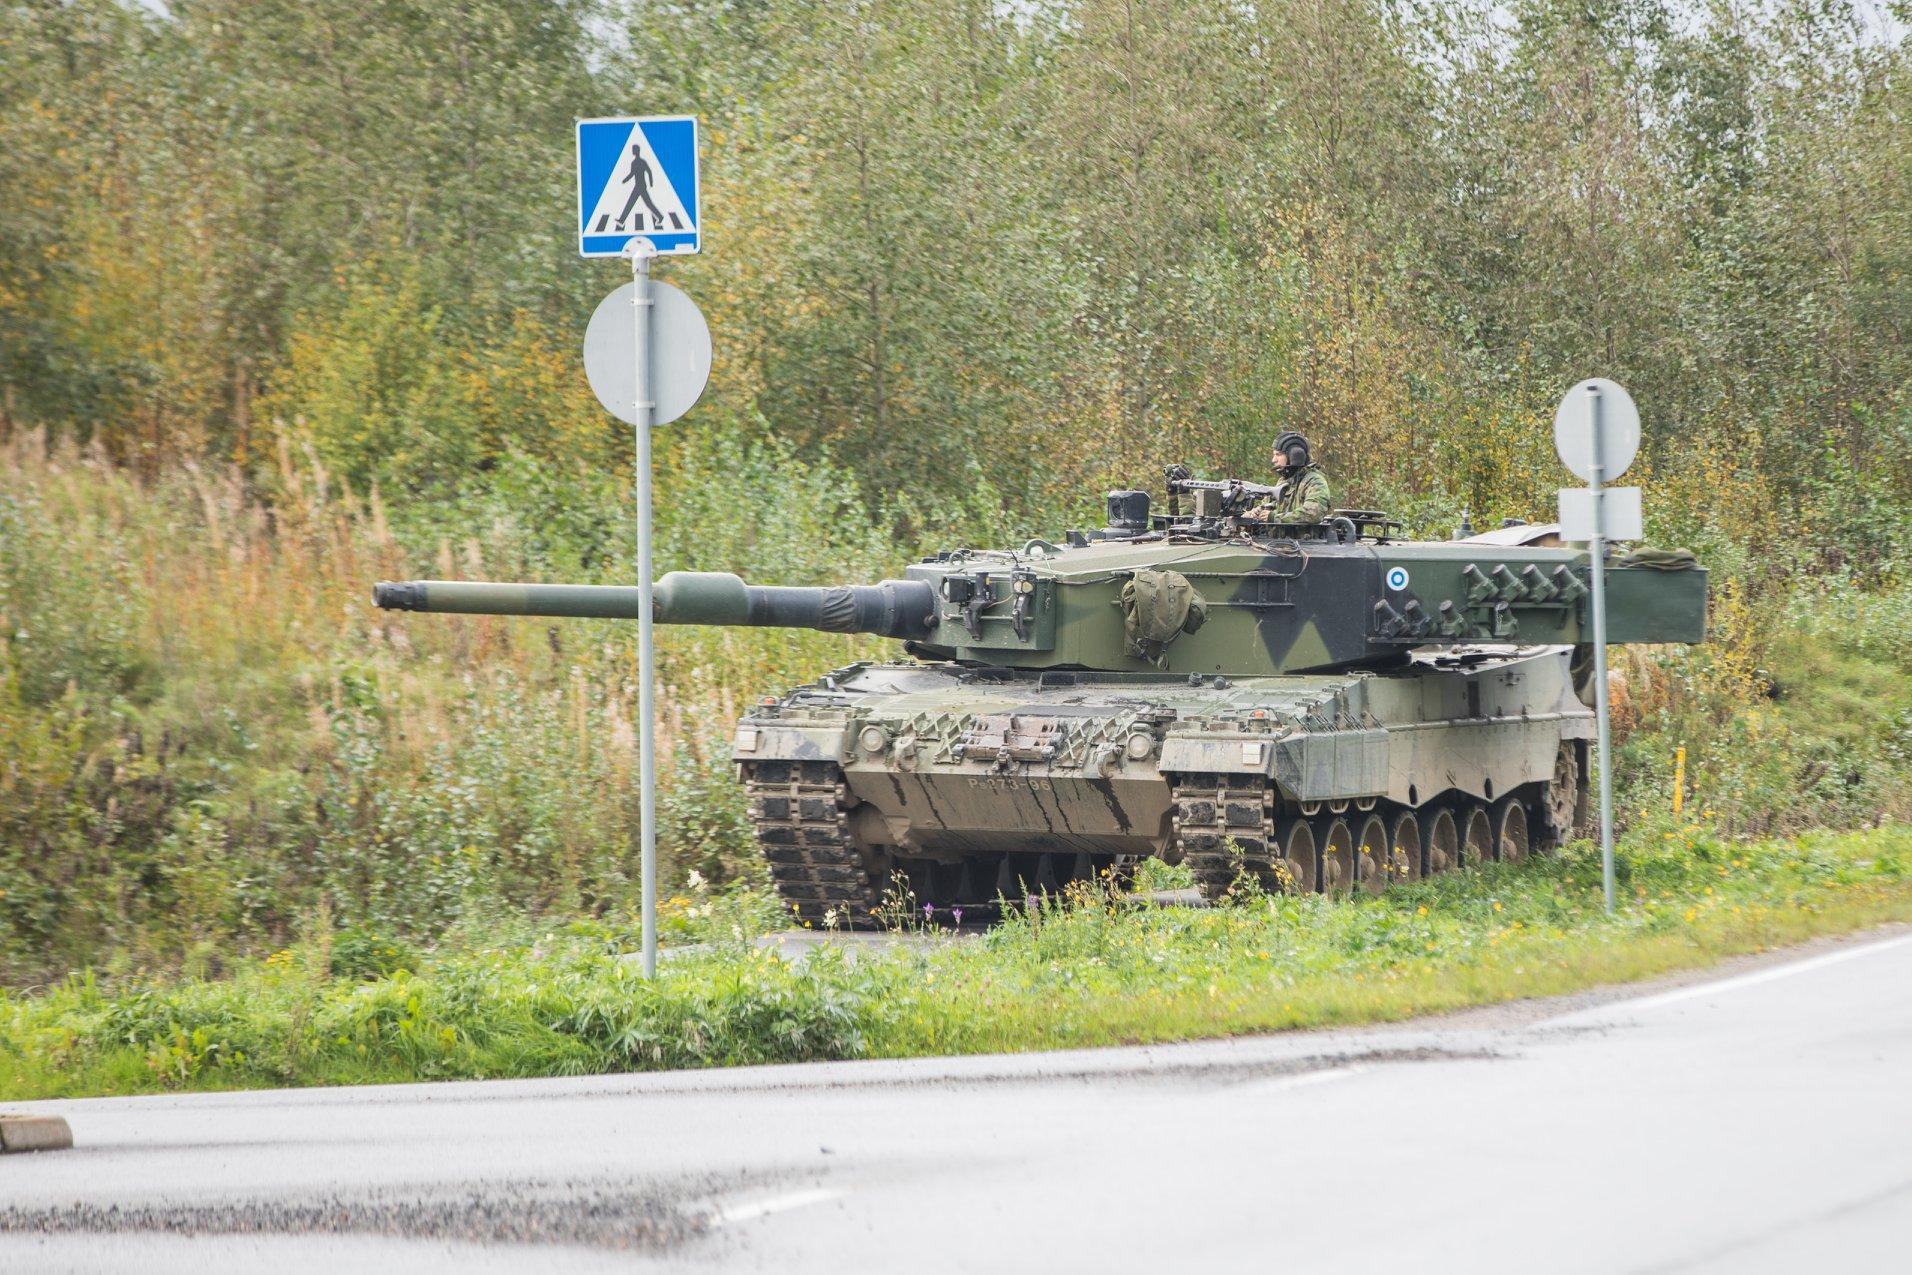 Armée Finlandaise / Finnish Defence Forces / puolustusvoimat - Page 10 41642386_1967725233250856_1842614821946654720_o-jpg